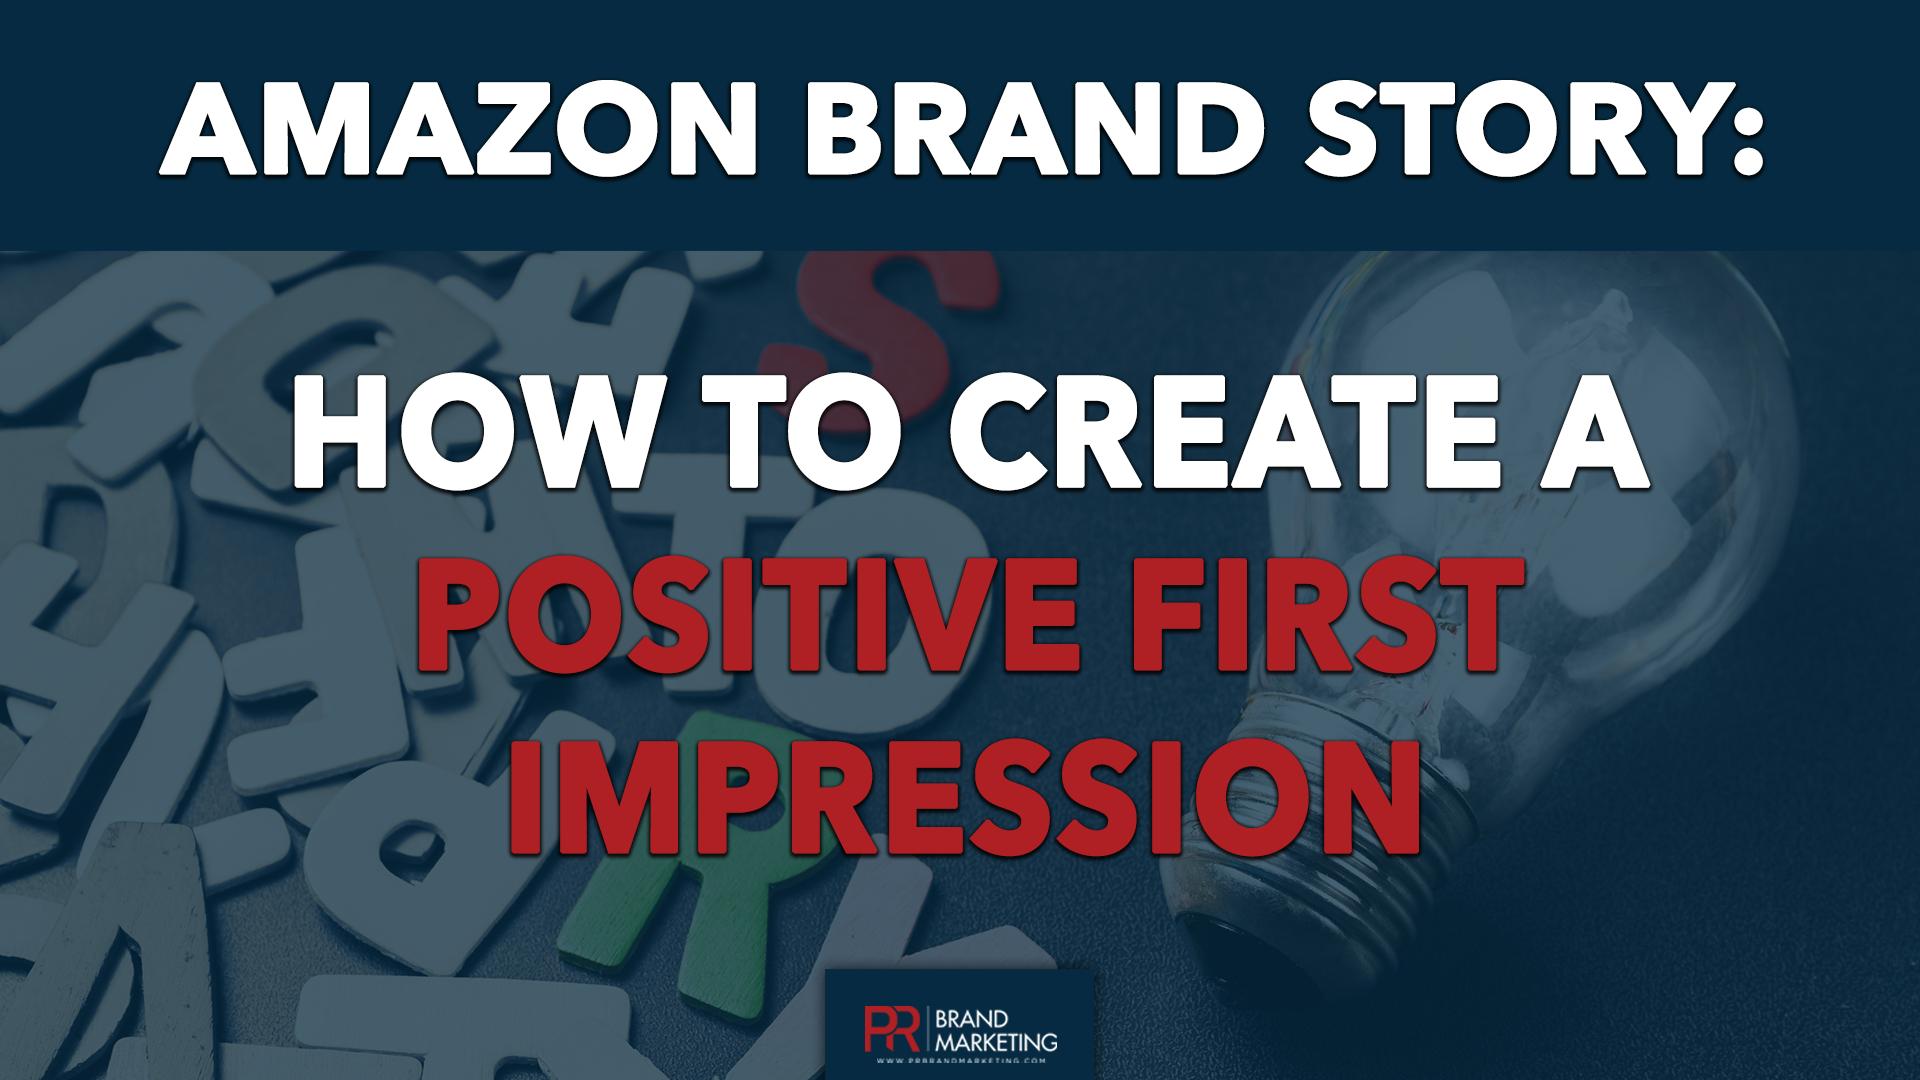 Amazon Brand Story